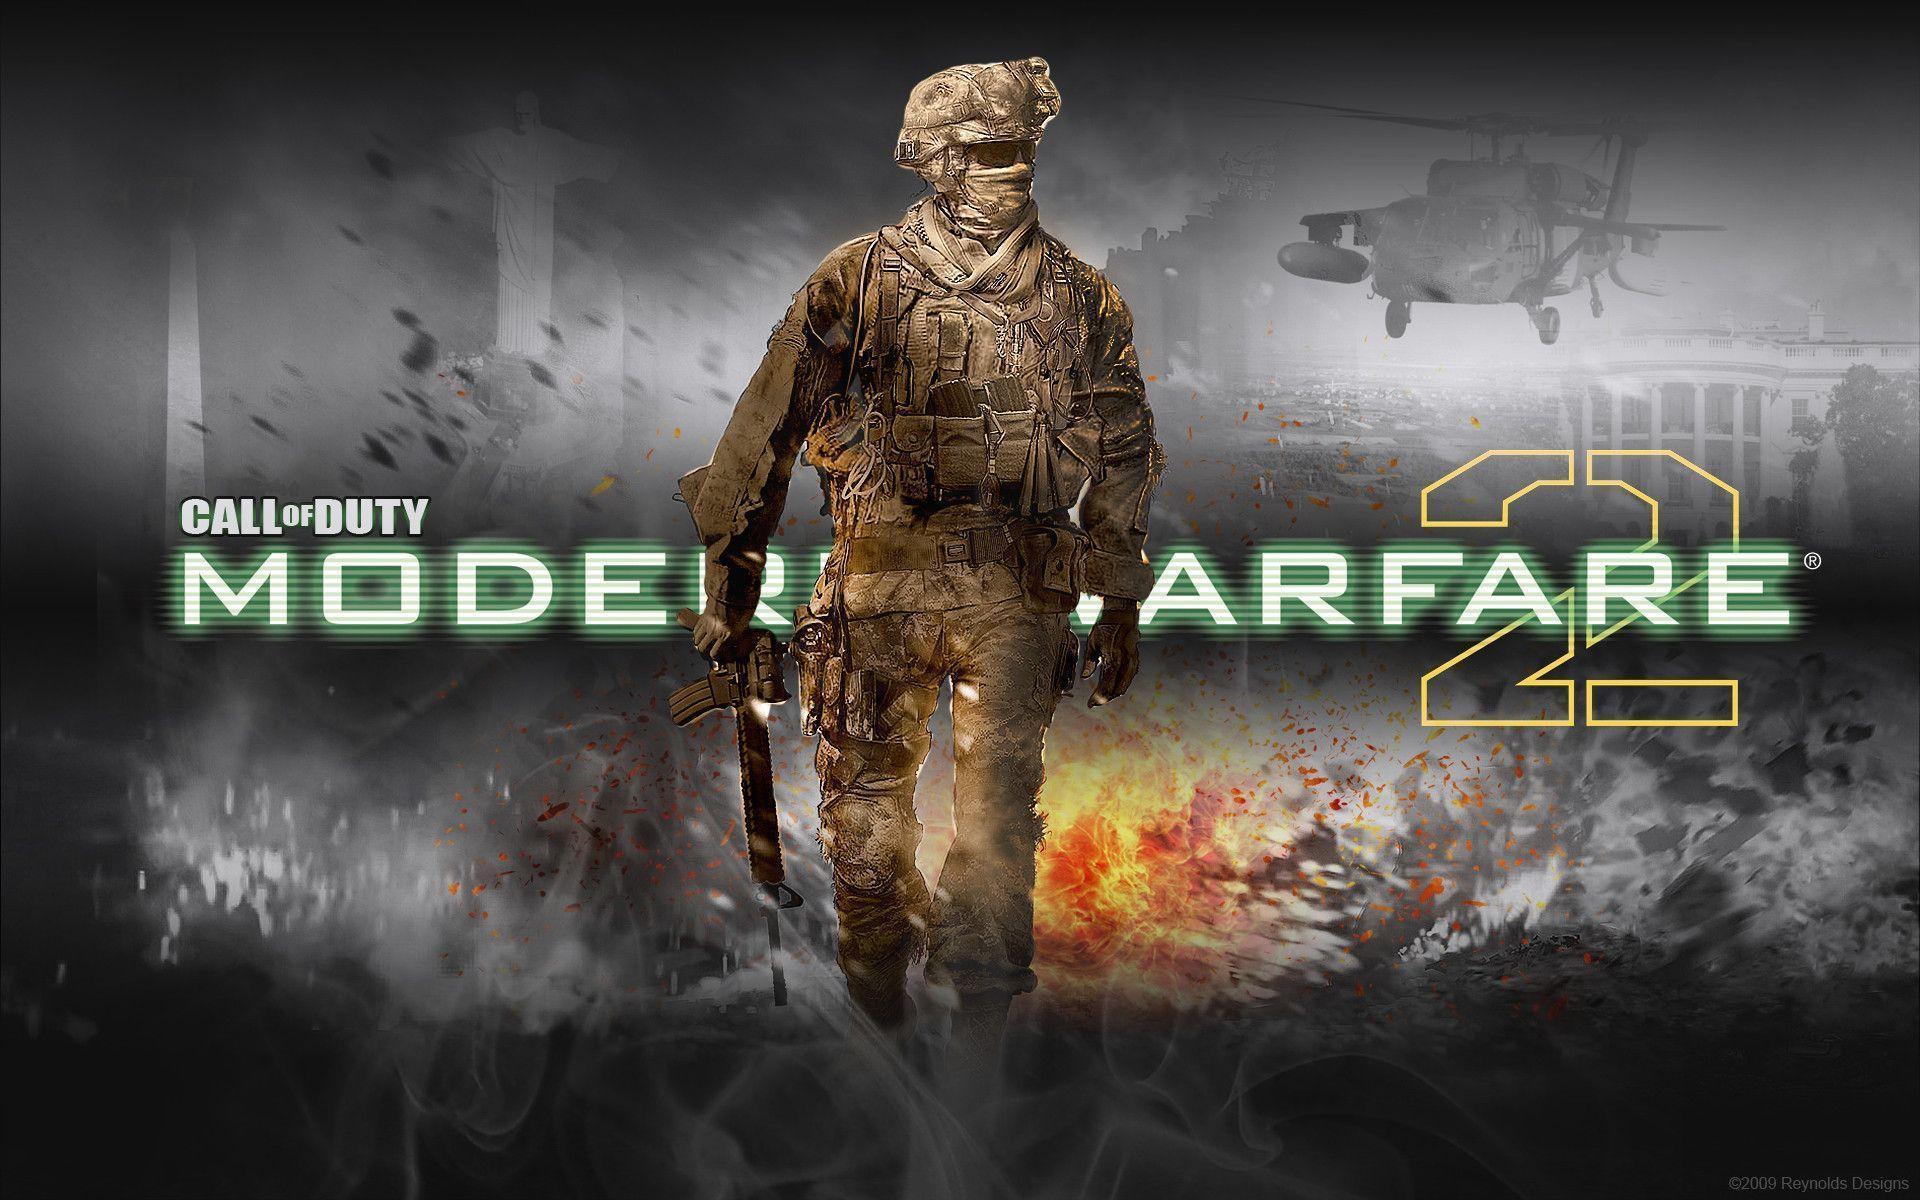 Modern Warfare 2 Wallpapers Hd Wallpaper Cave